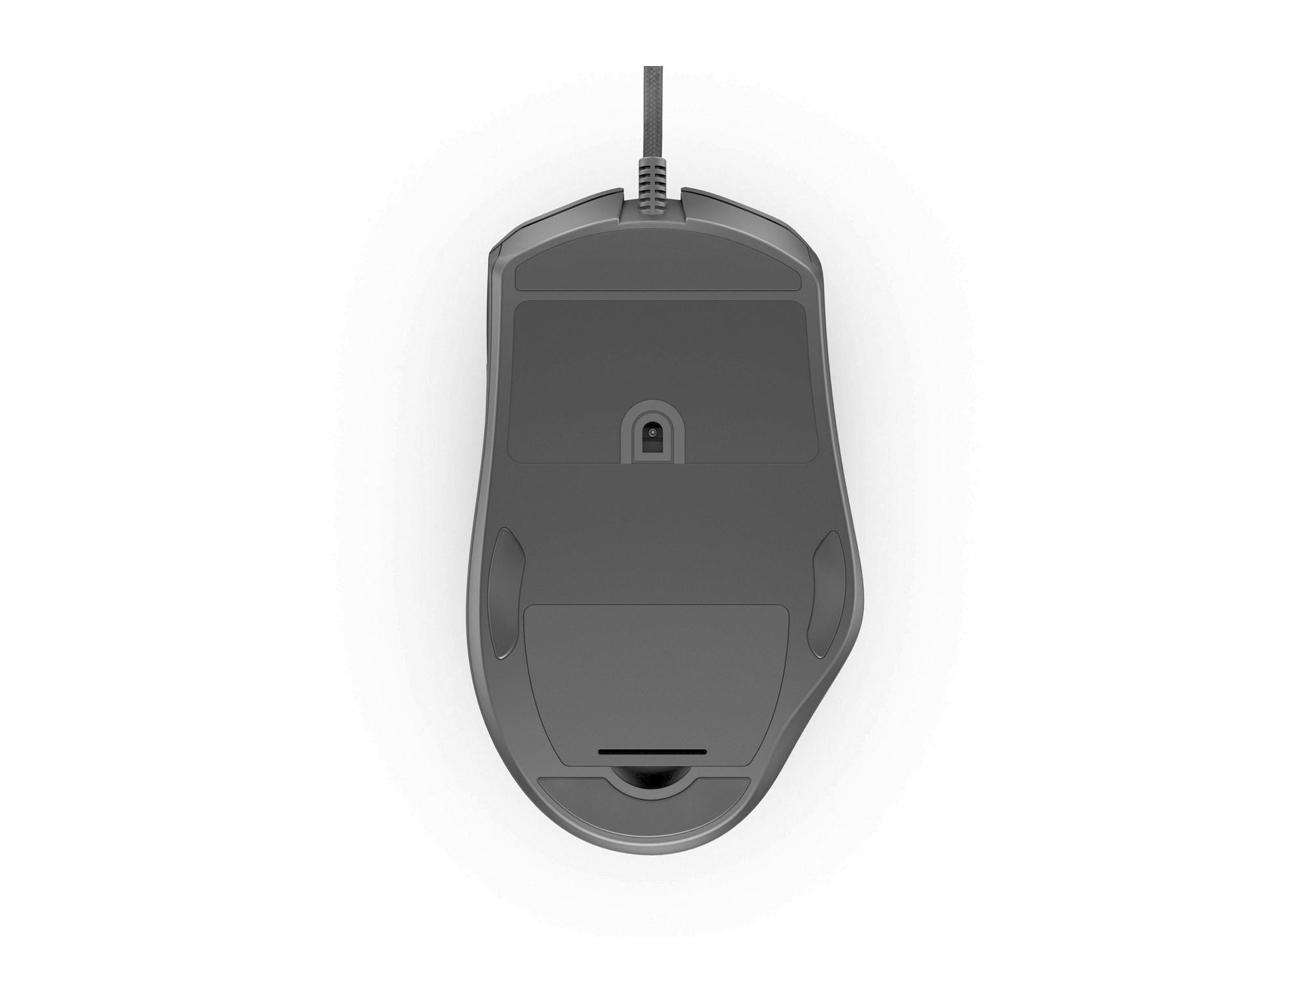 Hp Omen Gaming Mouse Gadget Flow